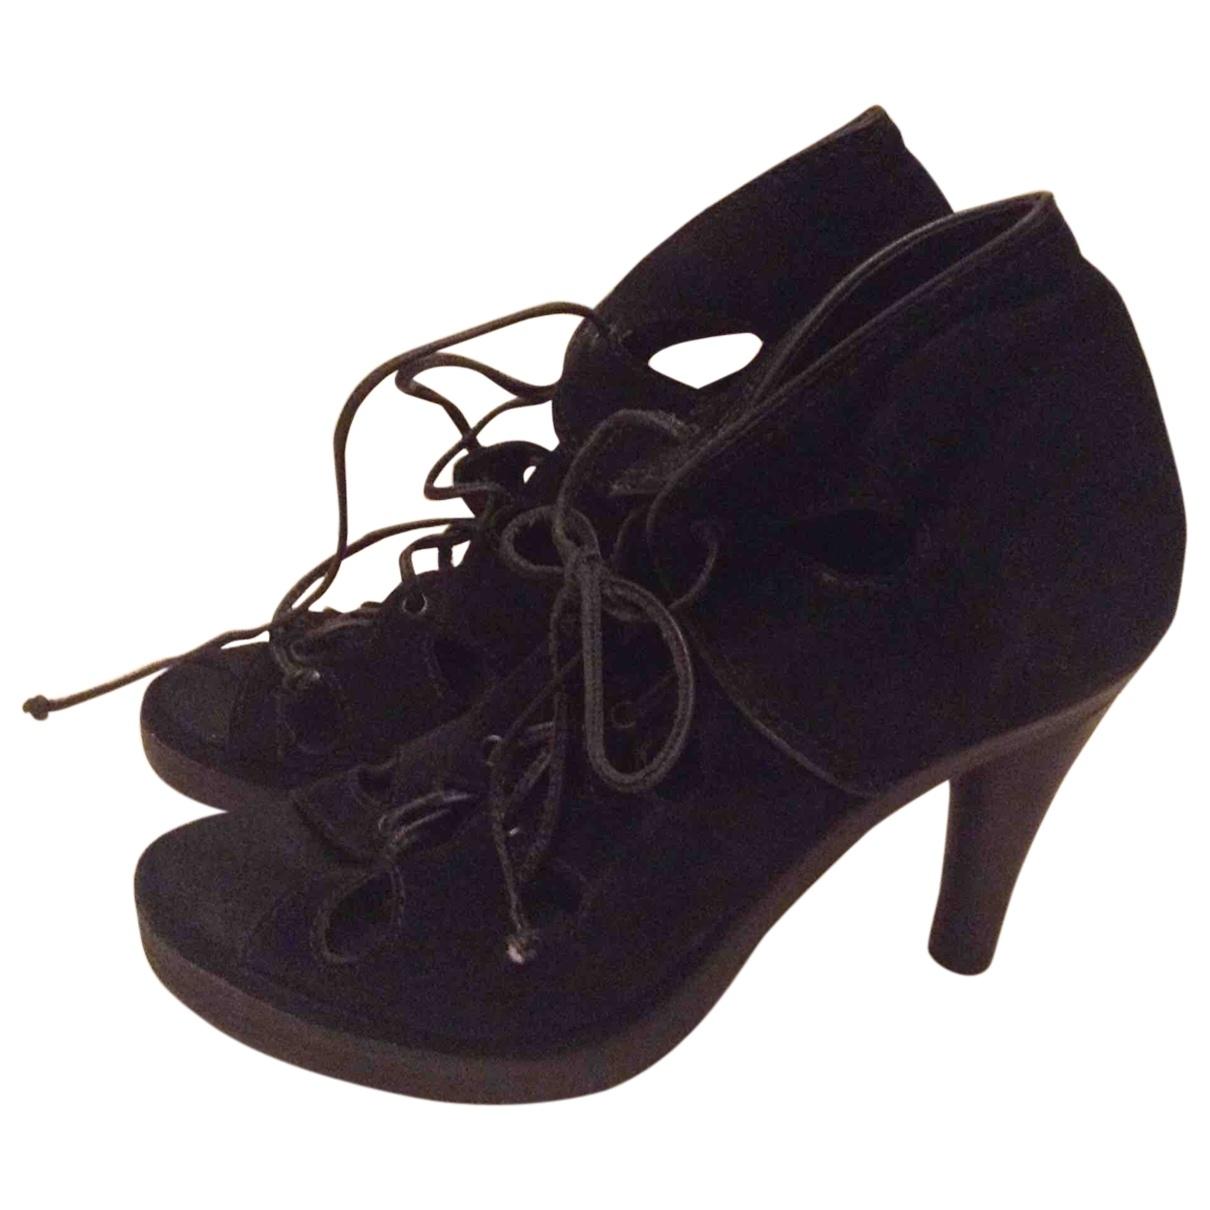 Zimmermann \N Black Suede Sandals for Women 37 EU